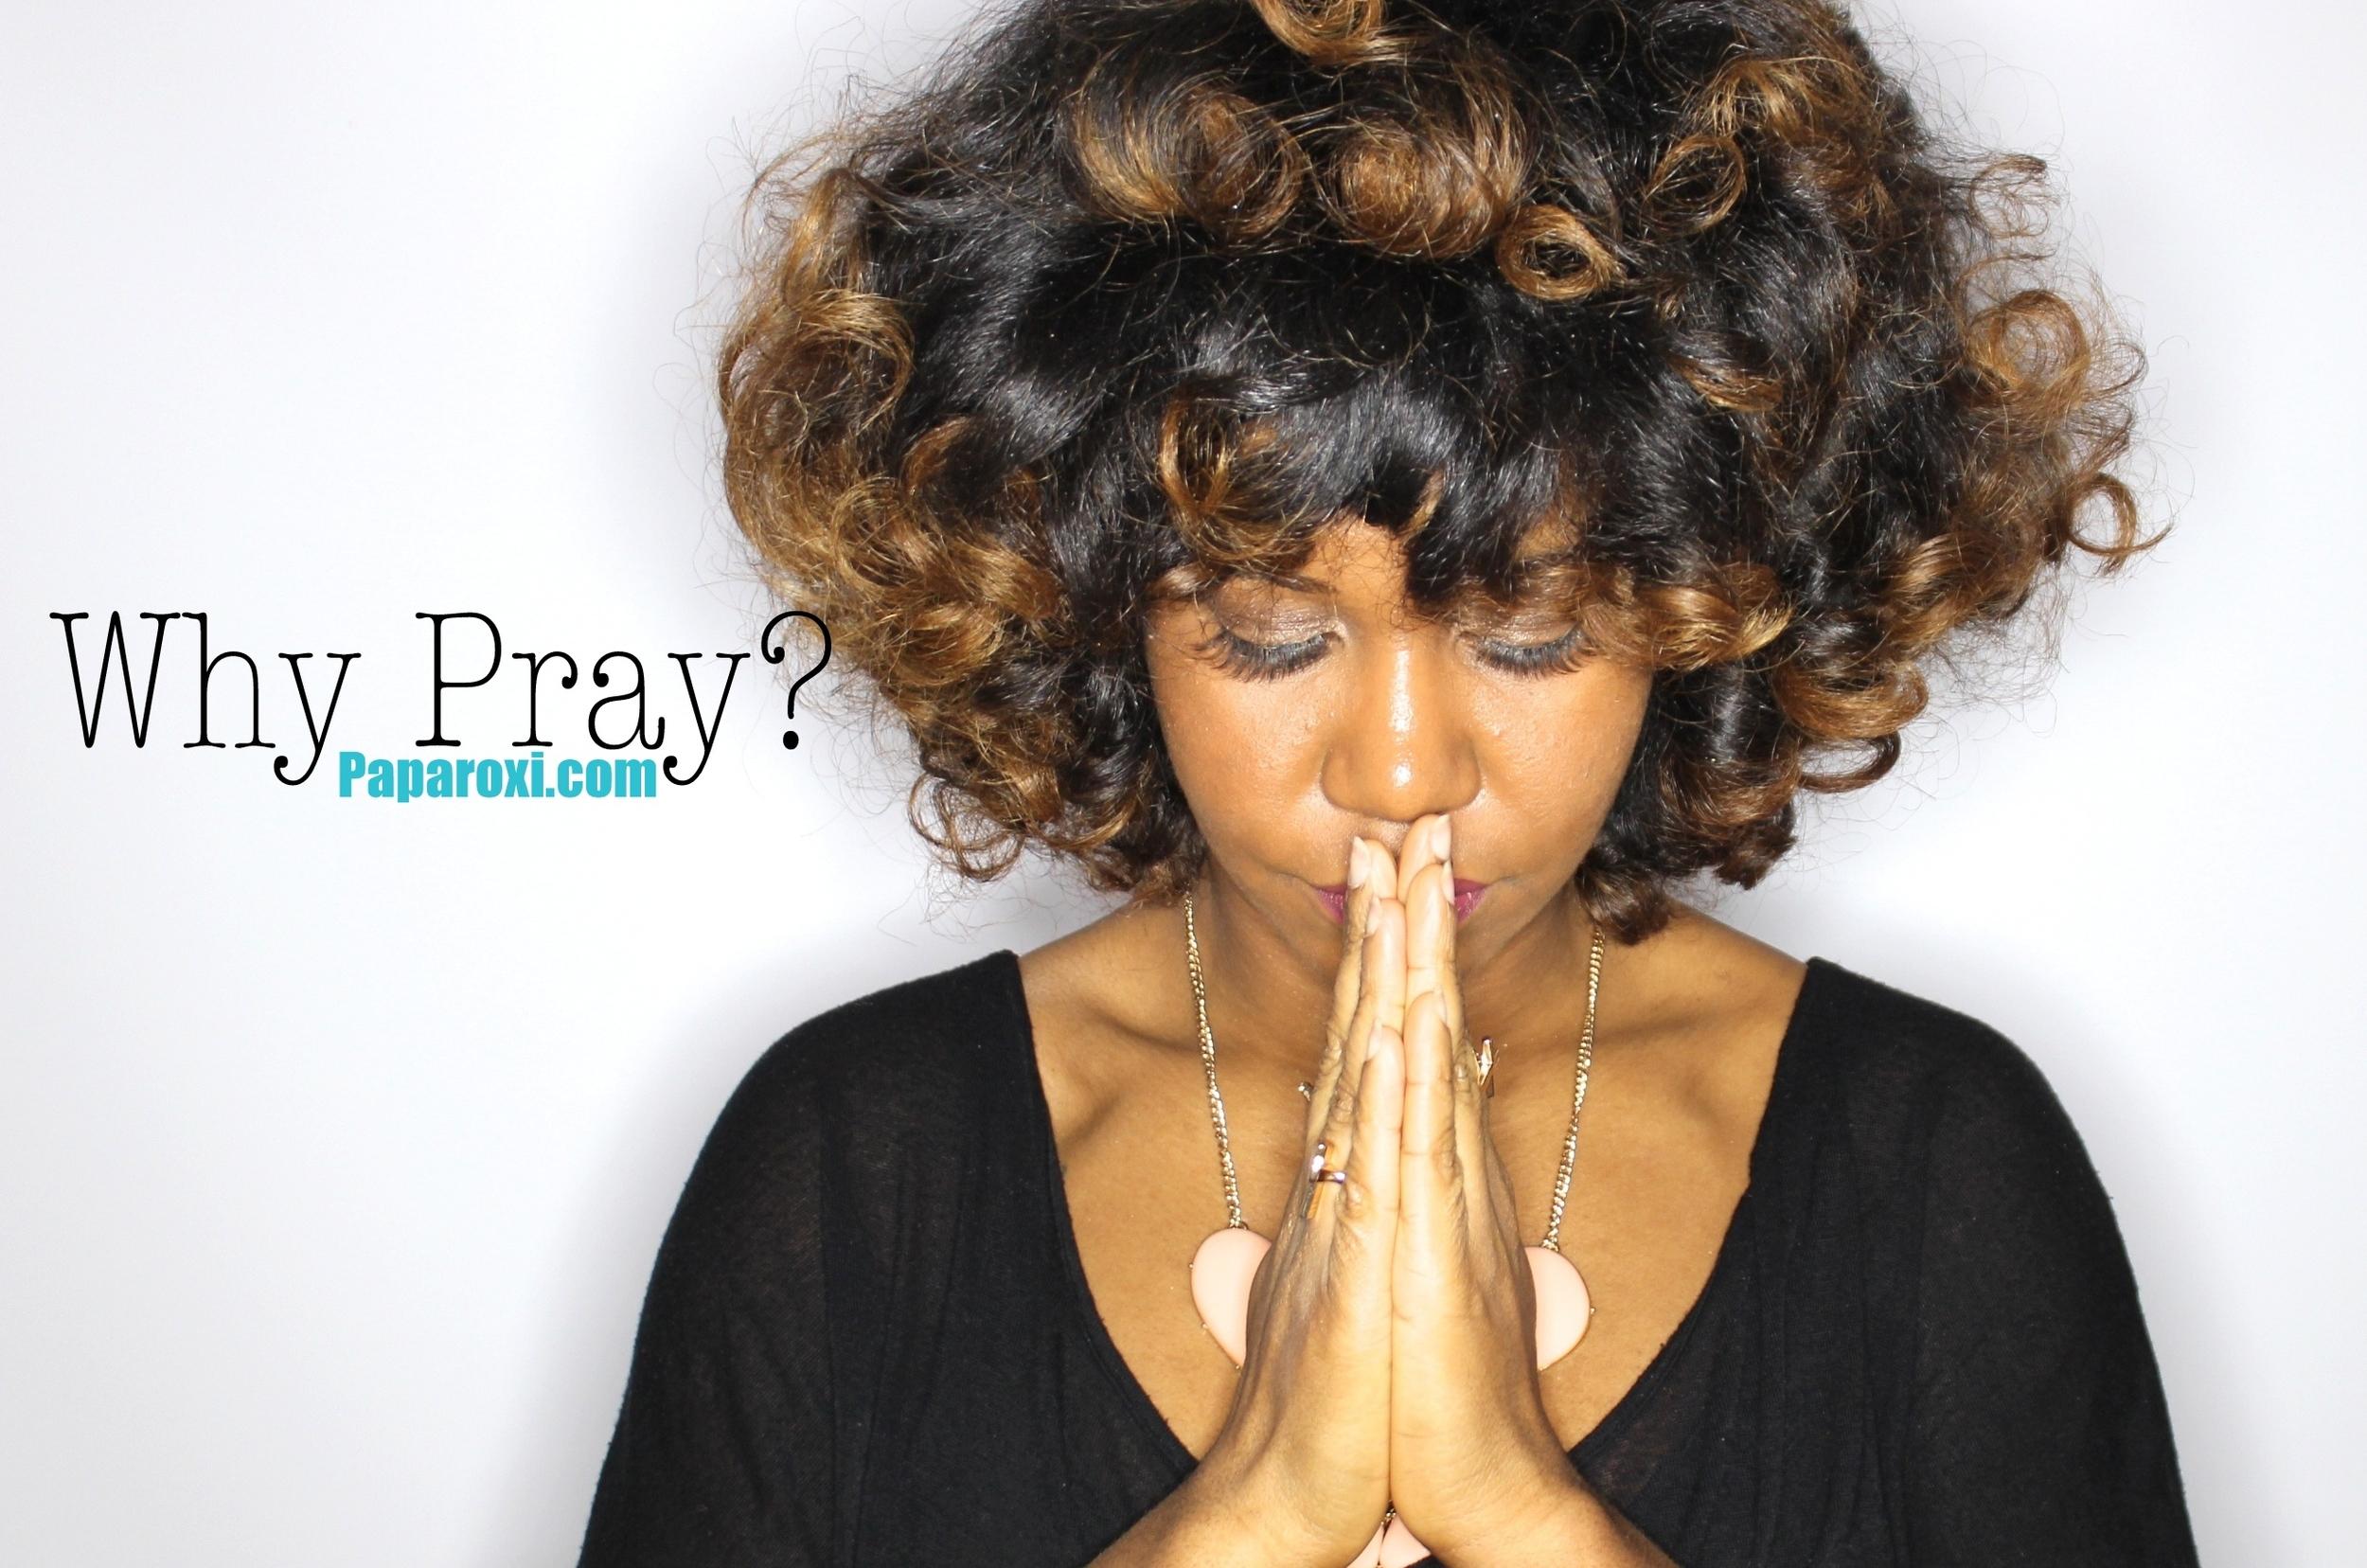 KLR_pray_text.JPG